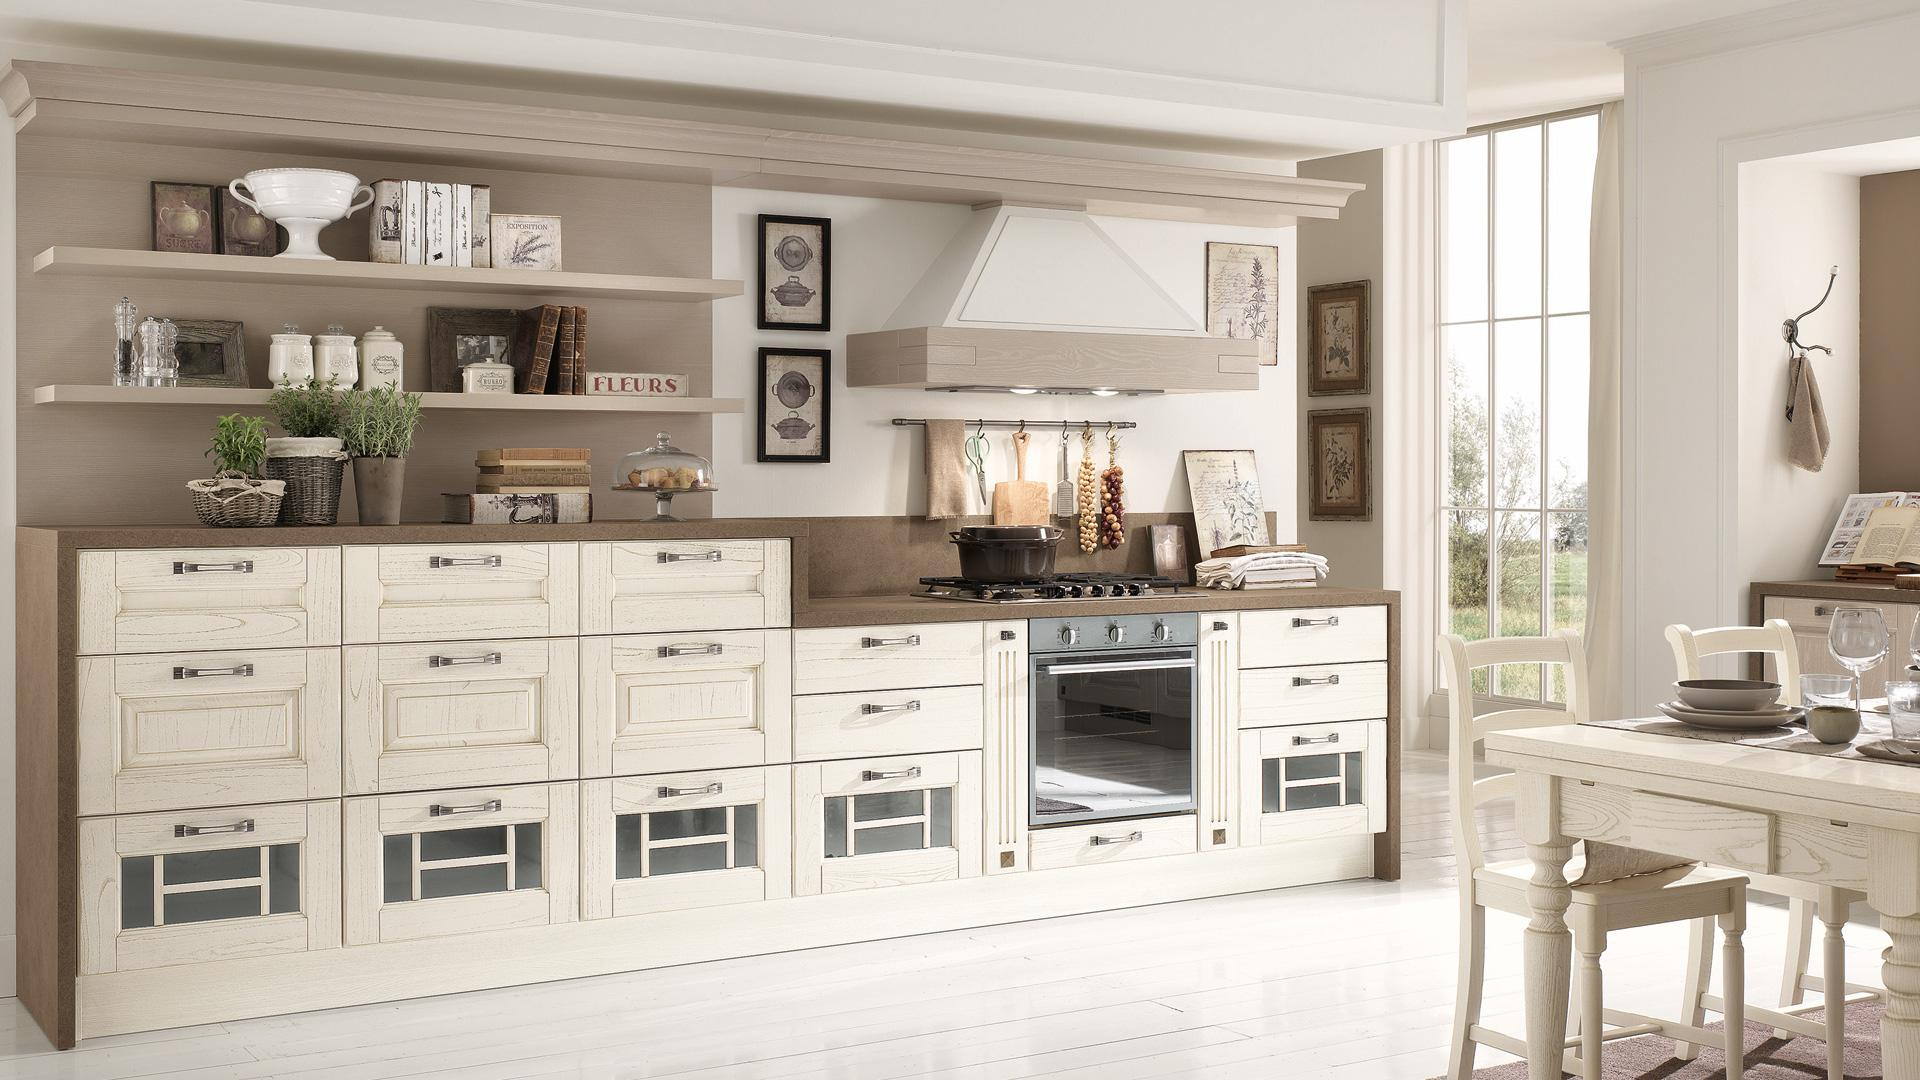 Quanto costa una cucina su misura cucina su misura - Quanto costa una cucina su misura ...